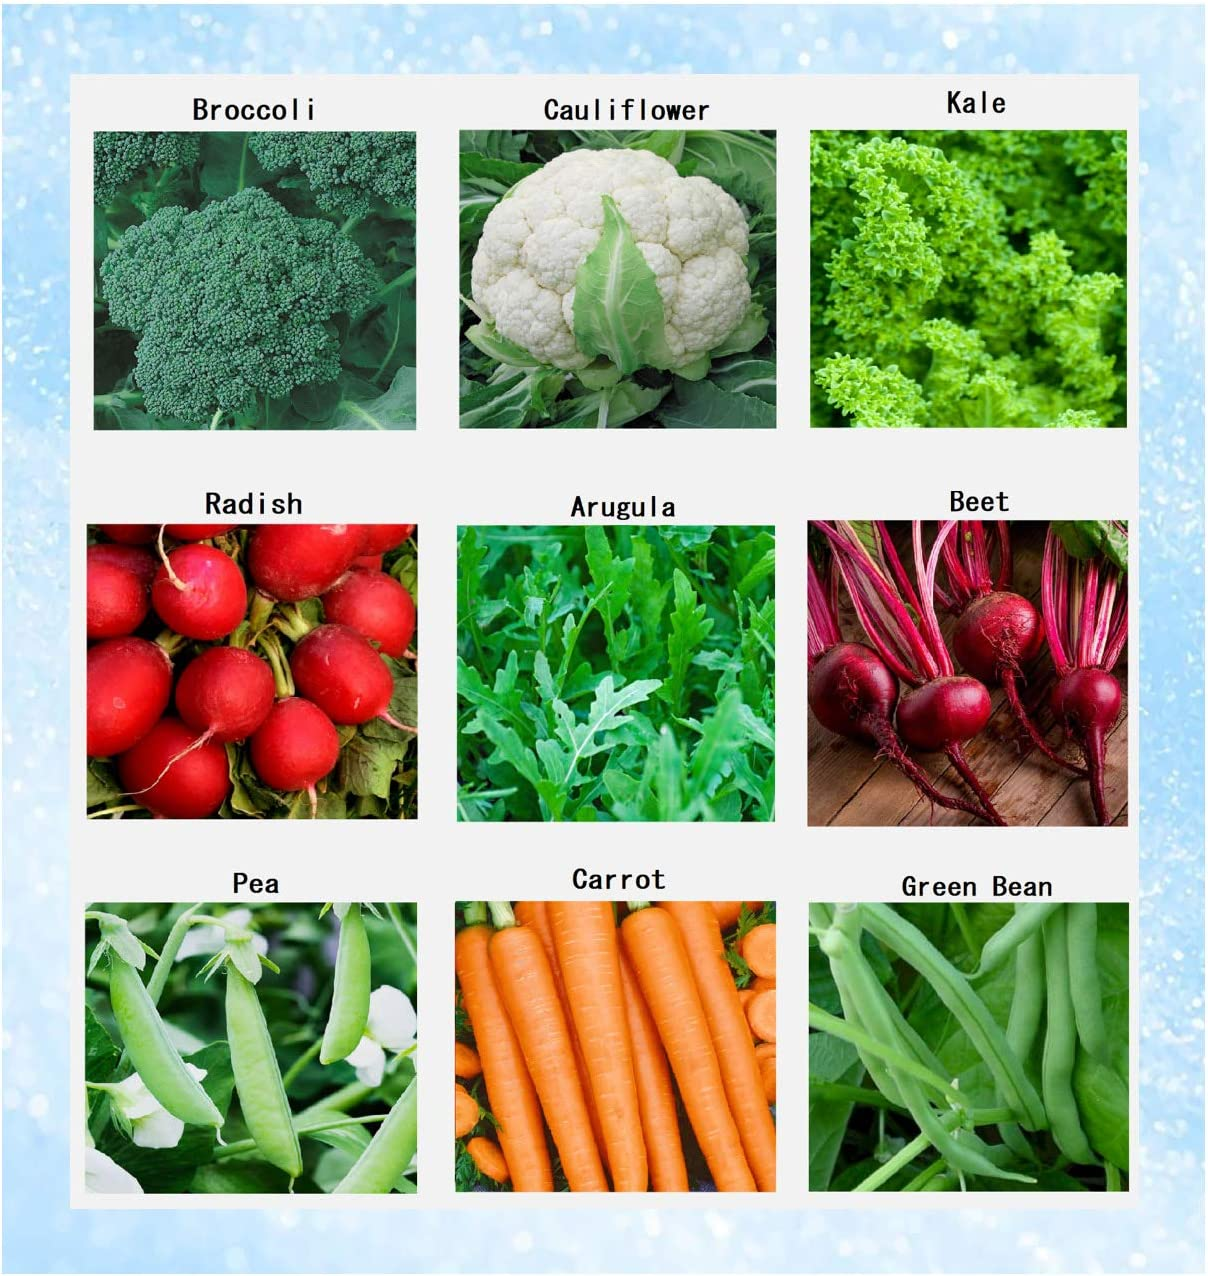 Premium Winter Vegetable Seeds Collection Organic Non-GMO Heirloom Seeds Radish, Pea, Broccoli, Beet, Carrot, Cauliflower, Green Bean, Kale, Arugula, Gardner and Chef Favorites